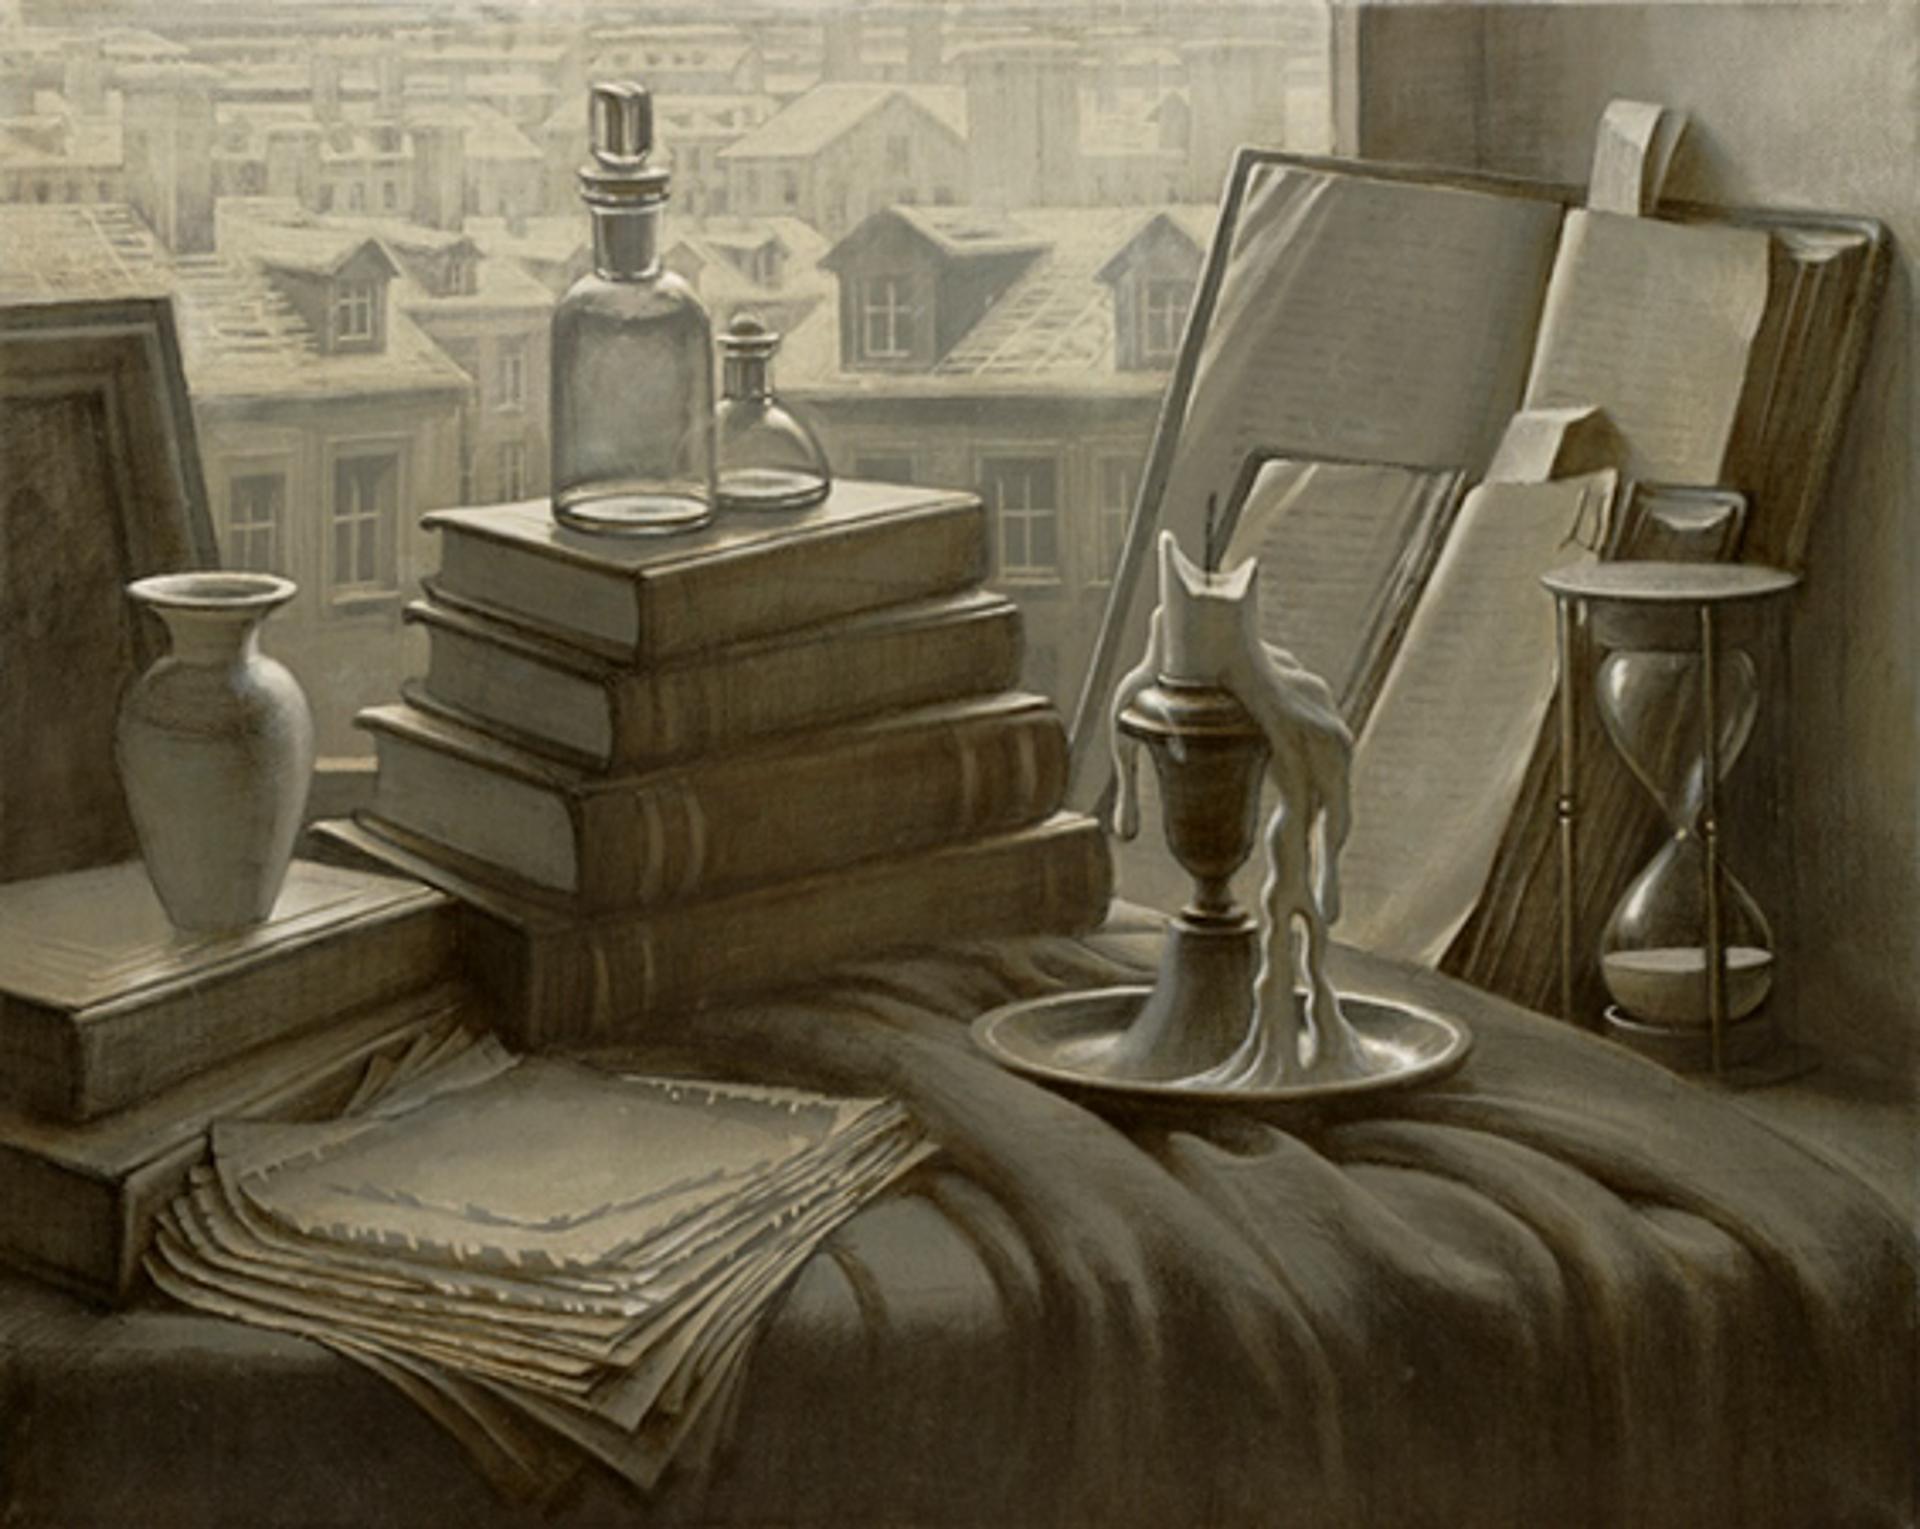 A Winter's Tale by Alexei Butirskiy